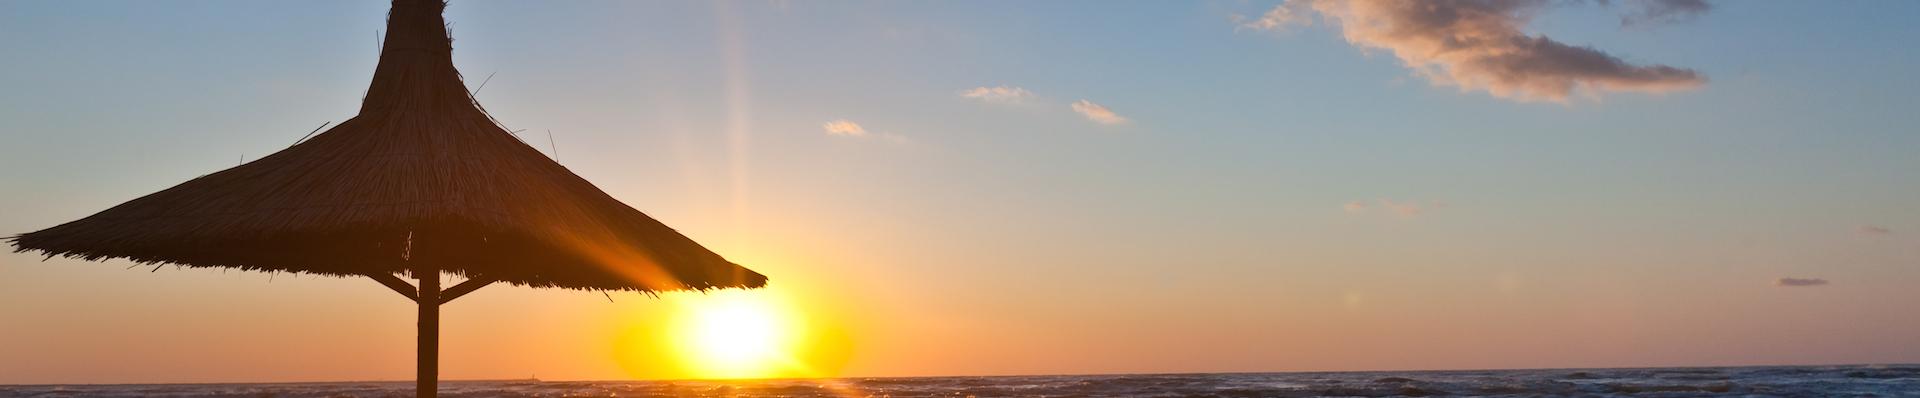 HFA - Hapimag Ferienclub Aktionärsvertretung Sonnenuntergang